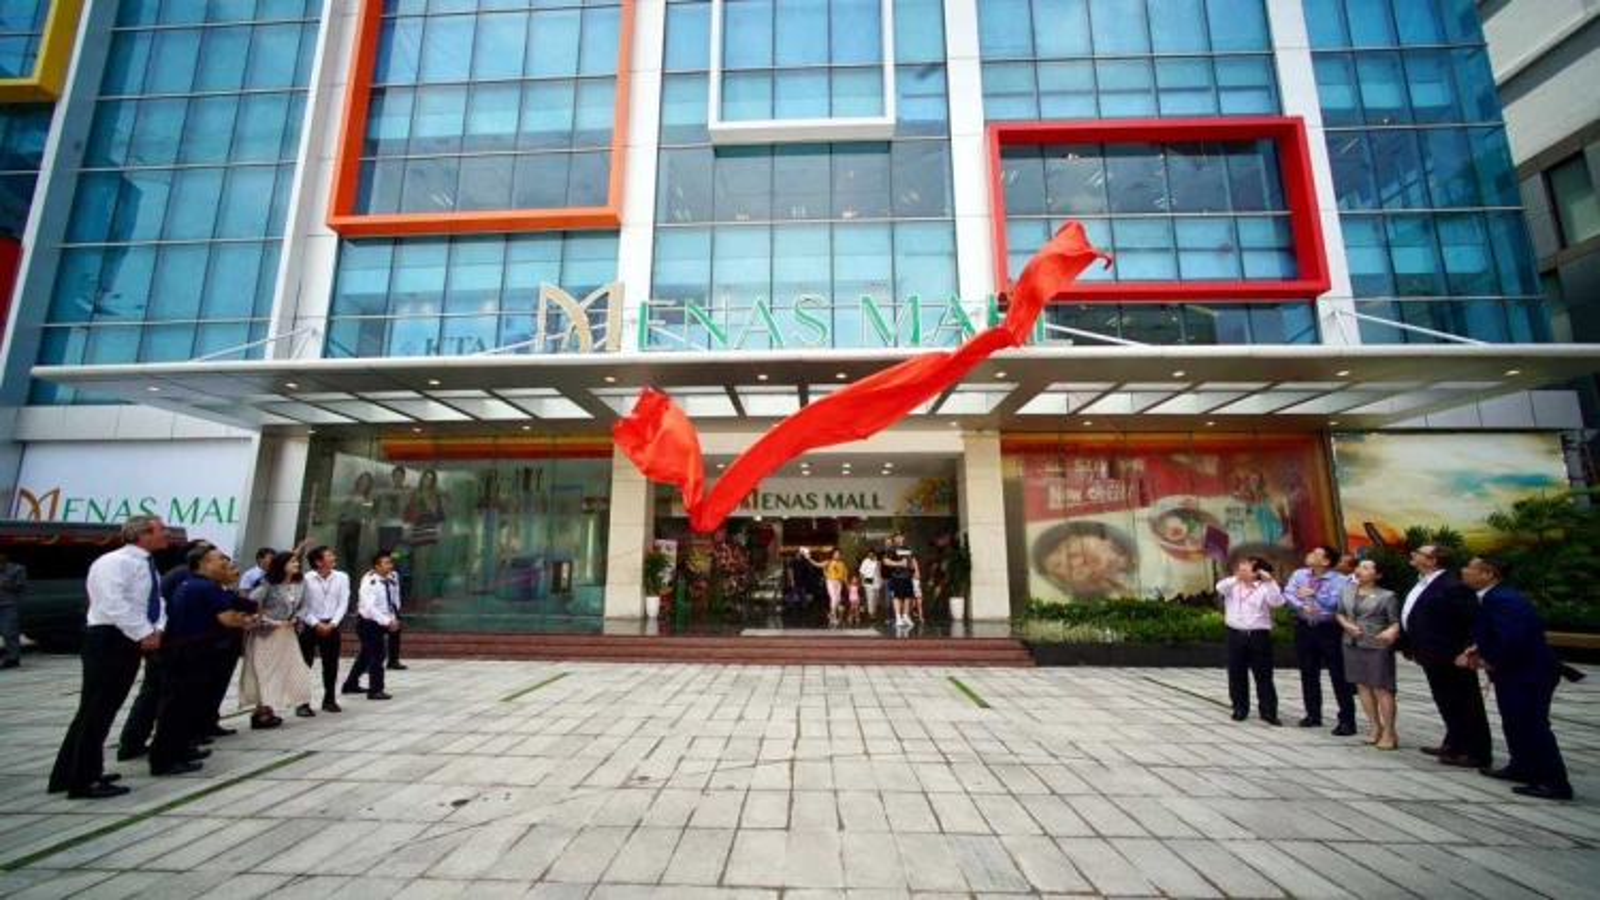 Menas Mall Saigon Airport sắp mở cửa trở lại